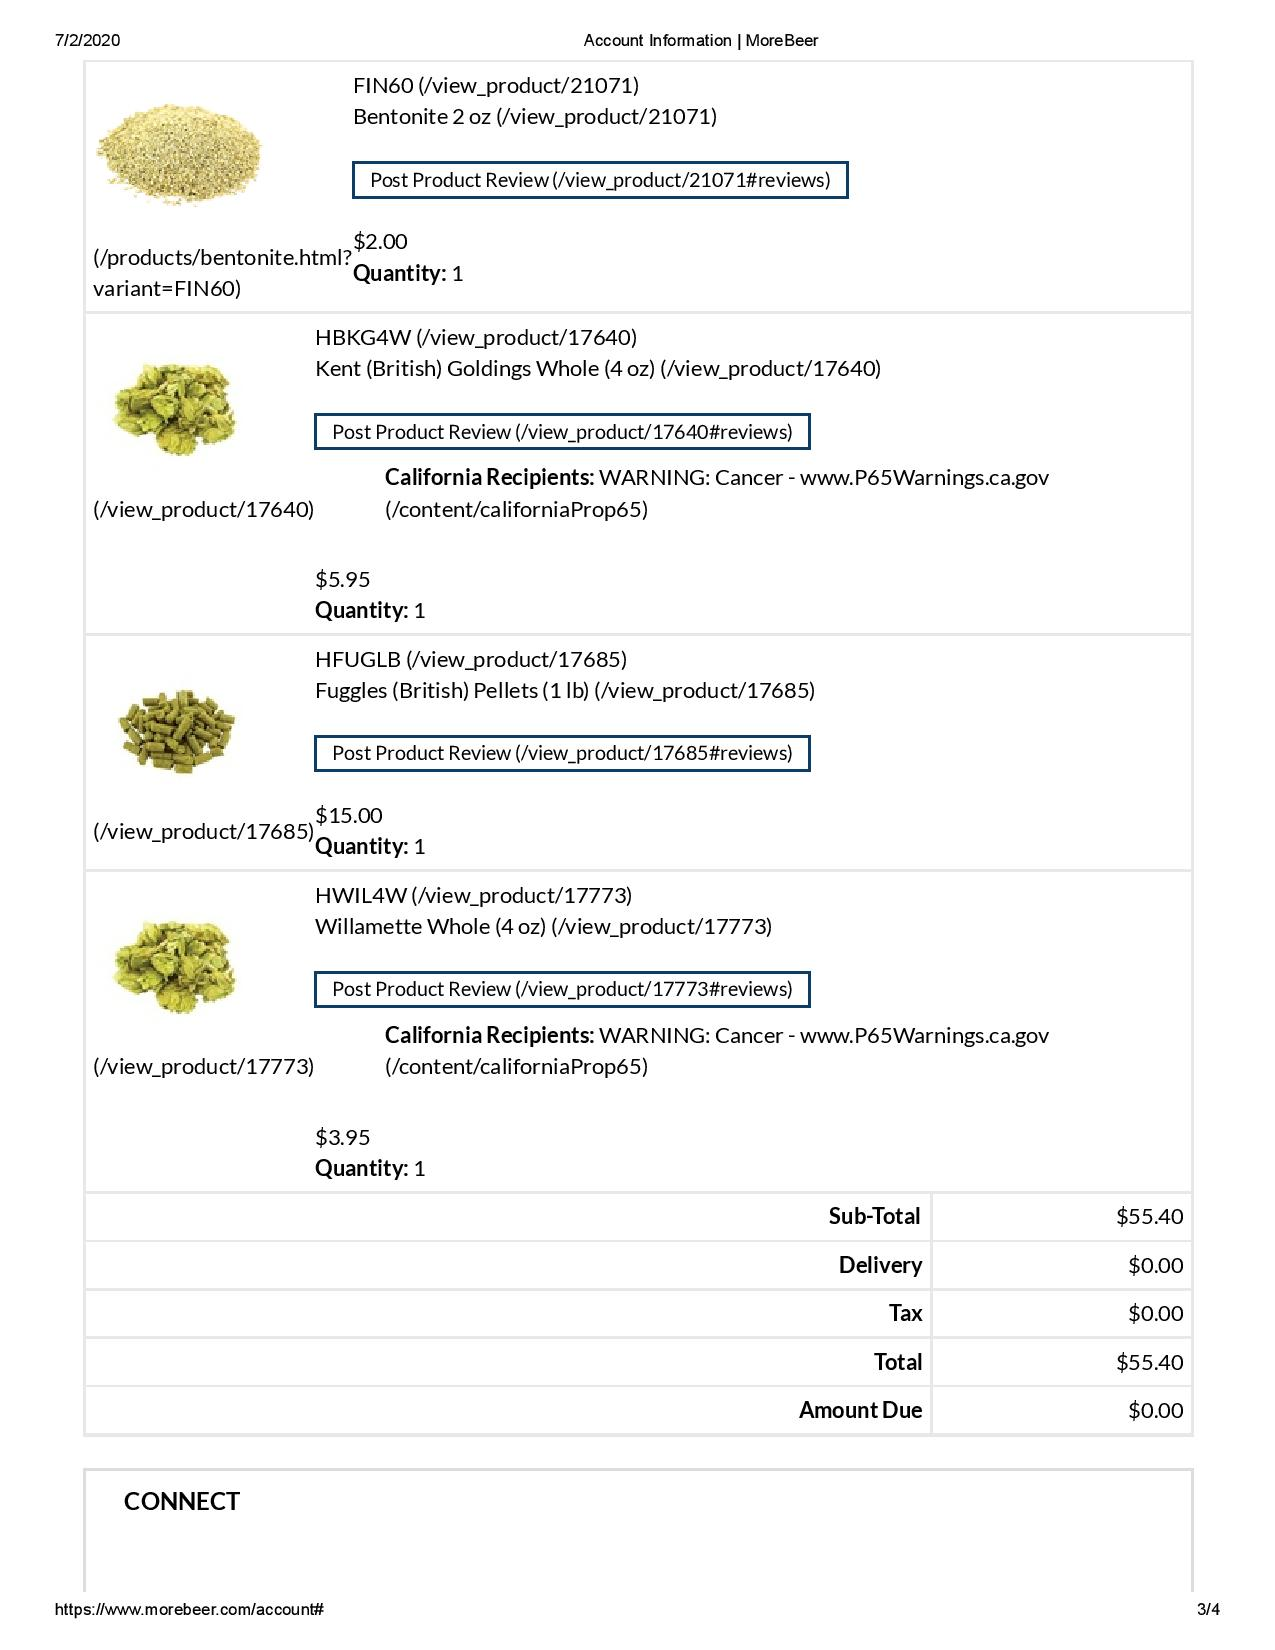 Account Information _ MoreBeer-page-003.jpg